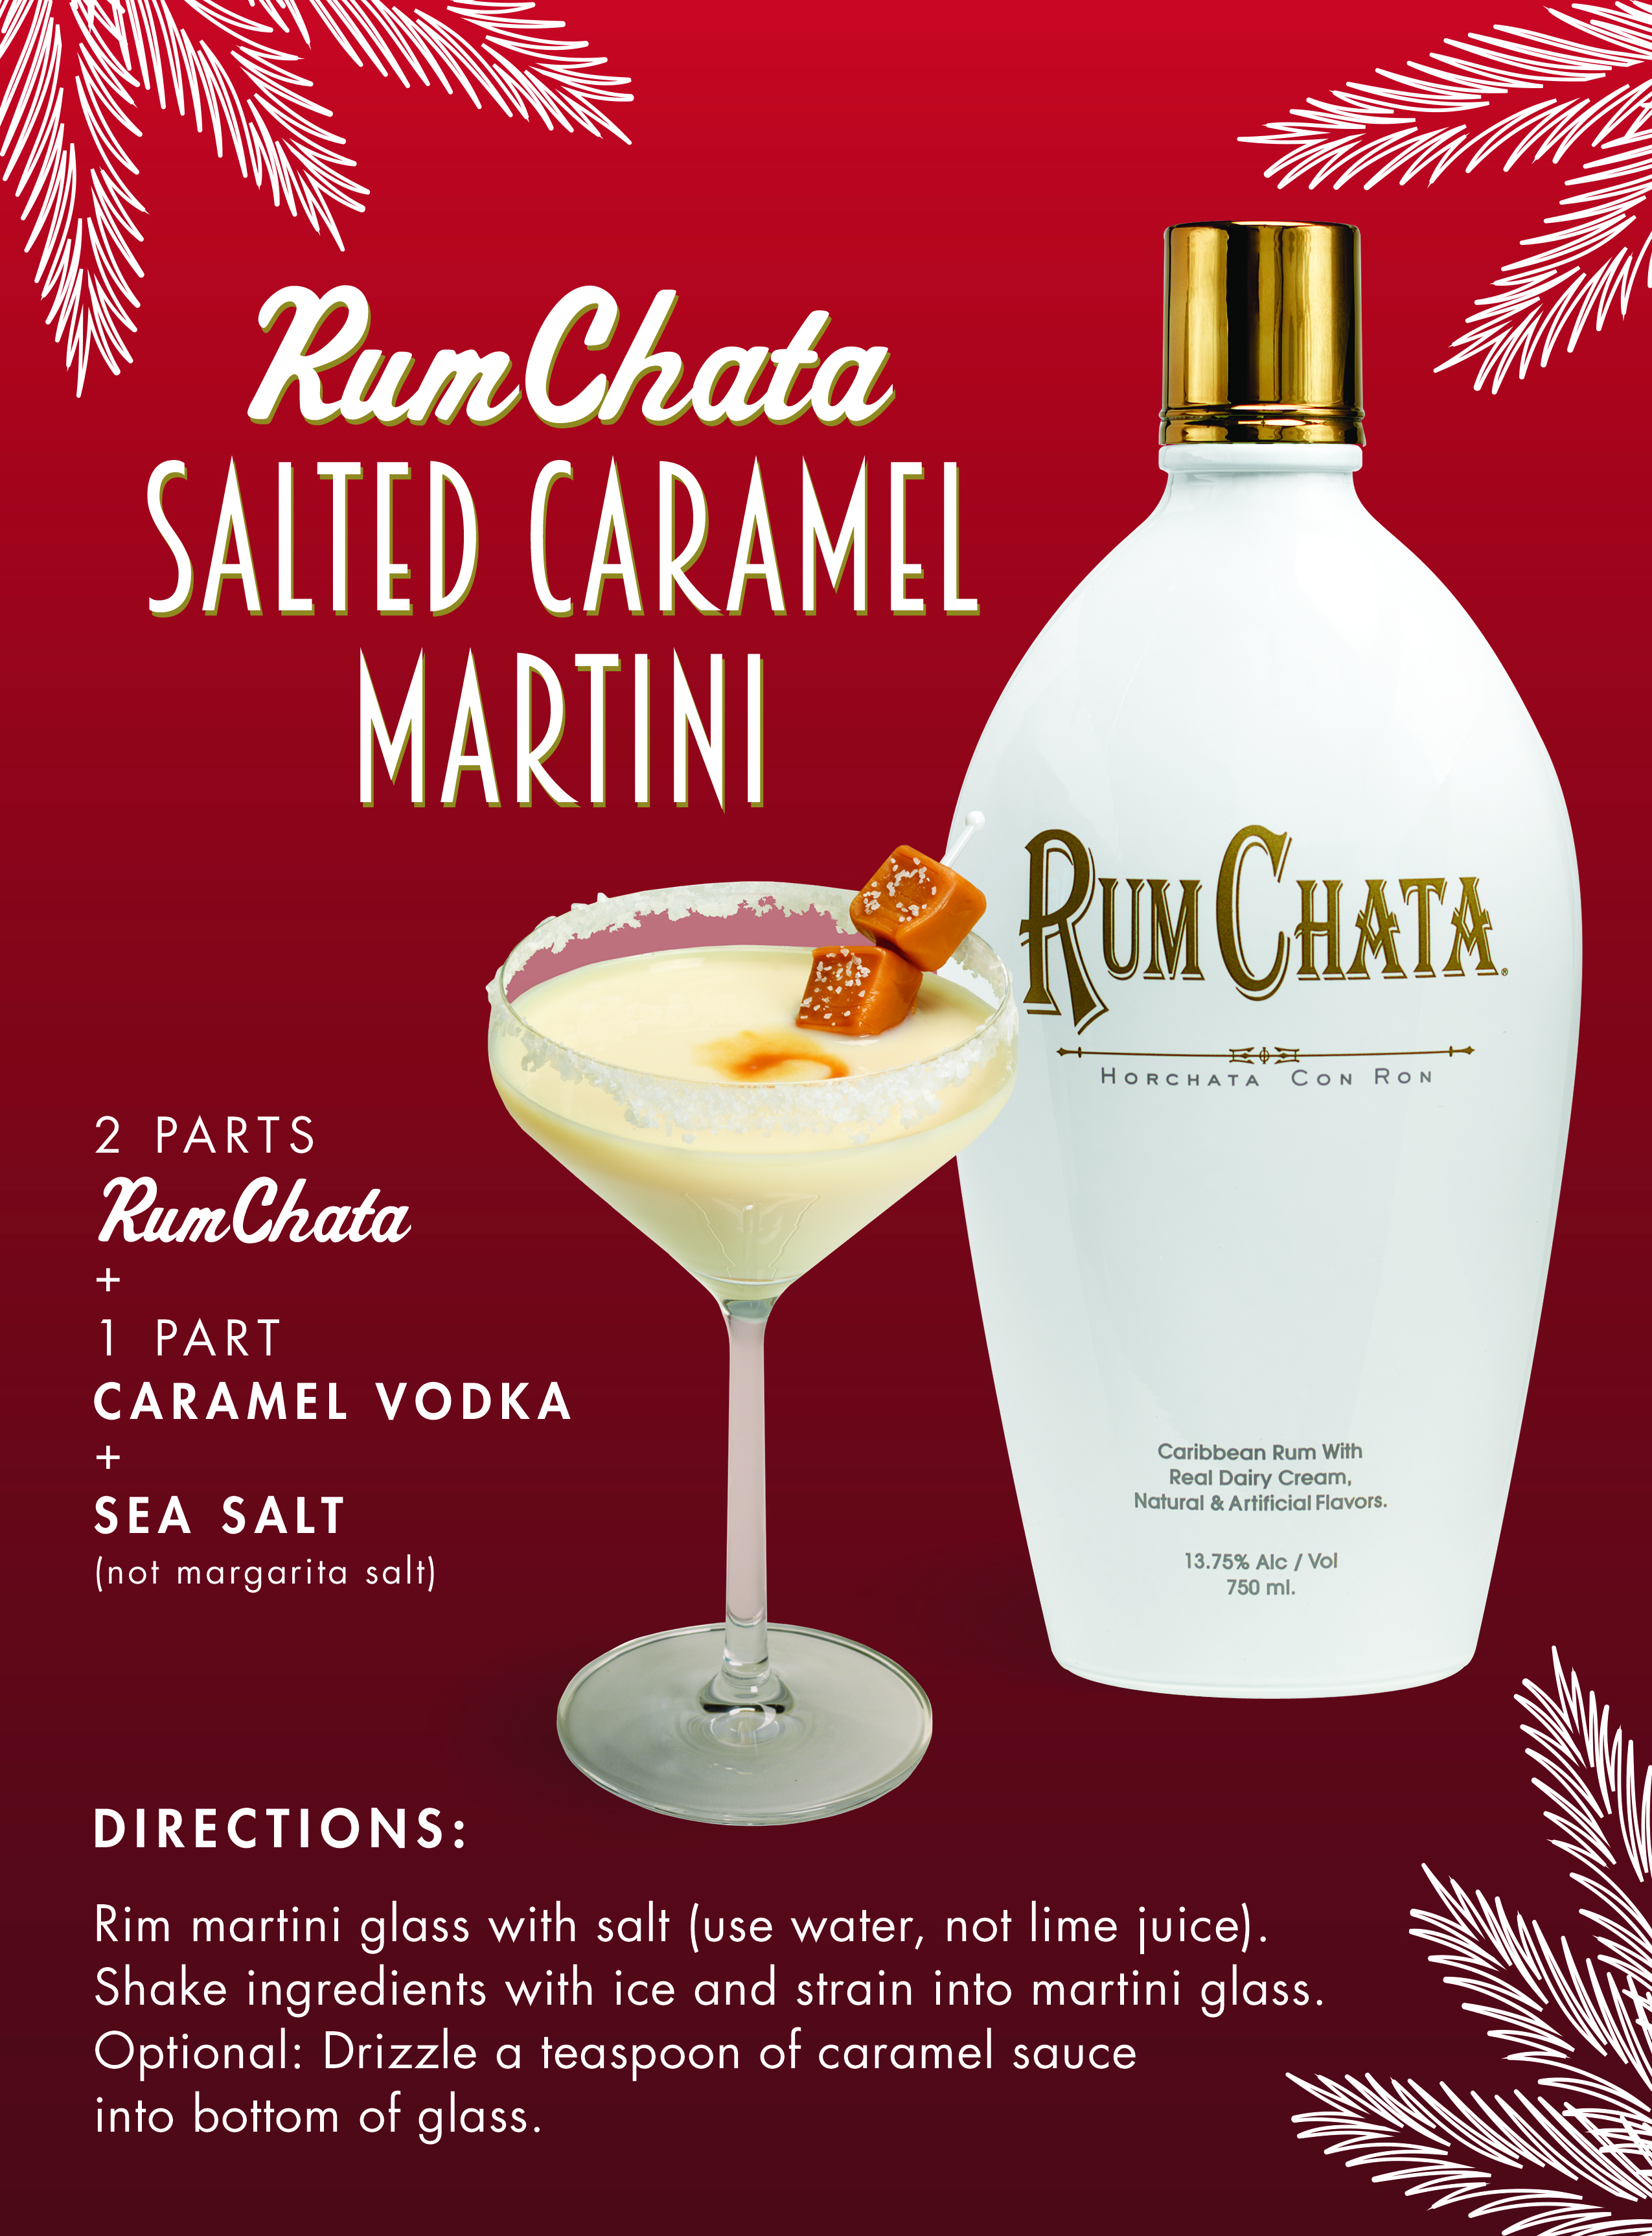 Salted Caramel Martini Recipe from RumChata [sponsored] - Alcademics